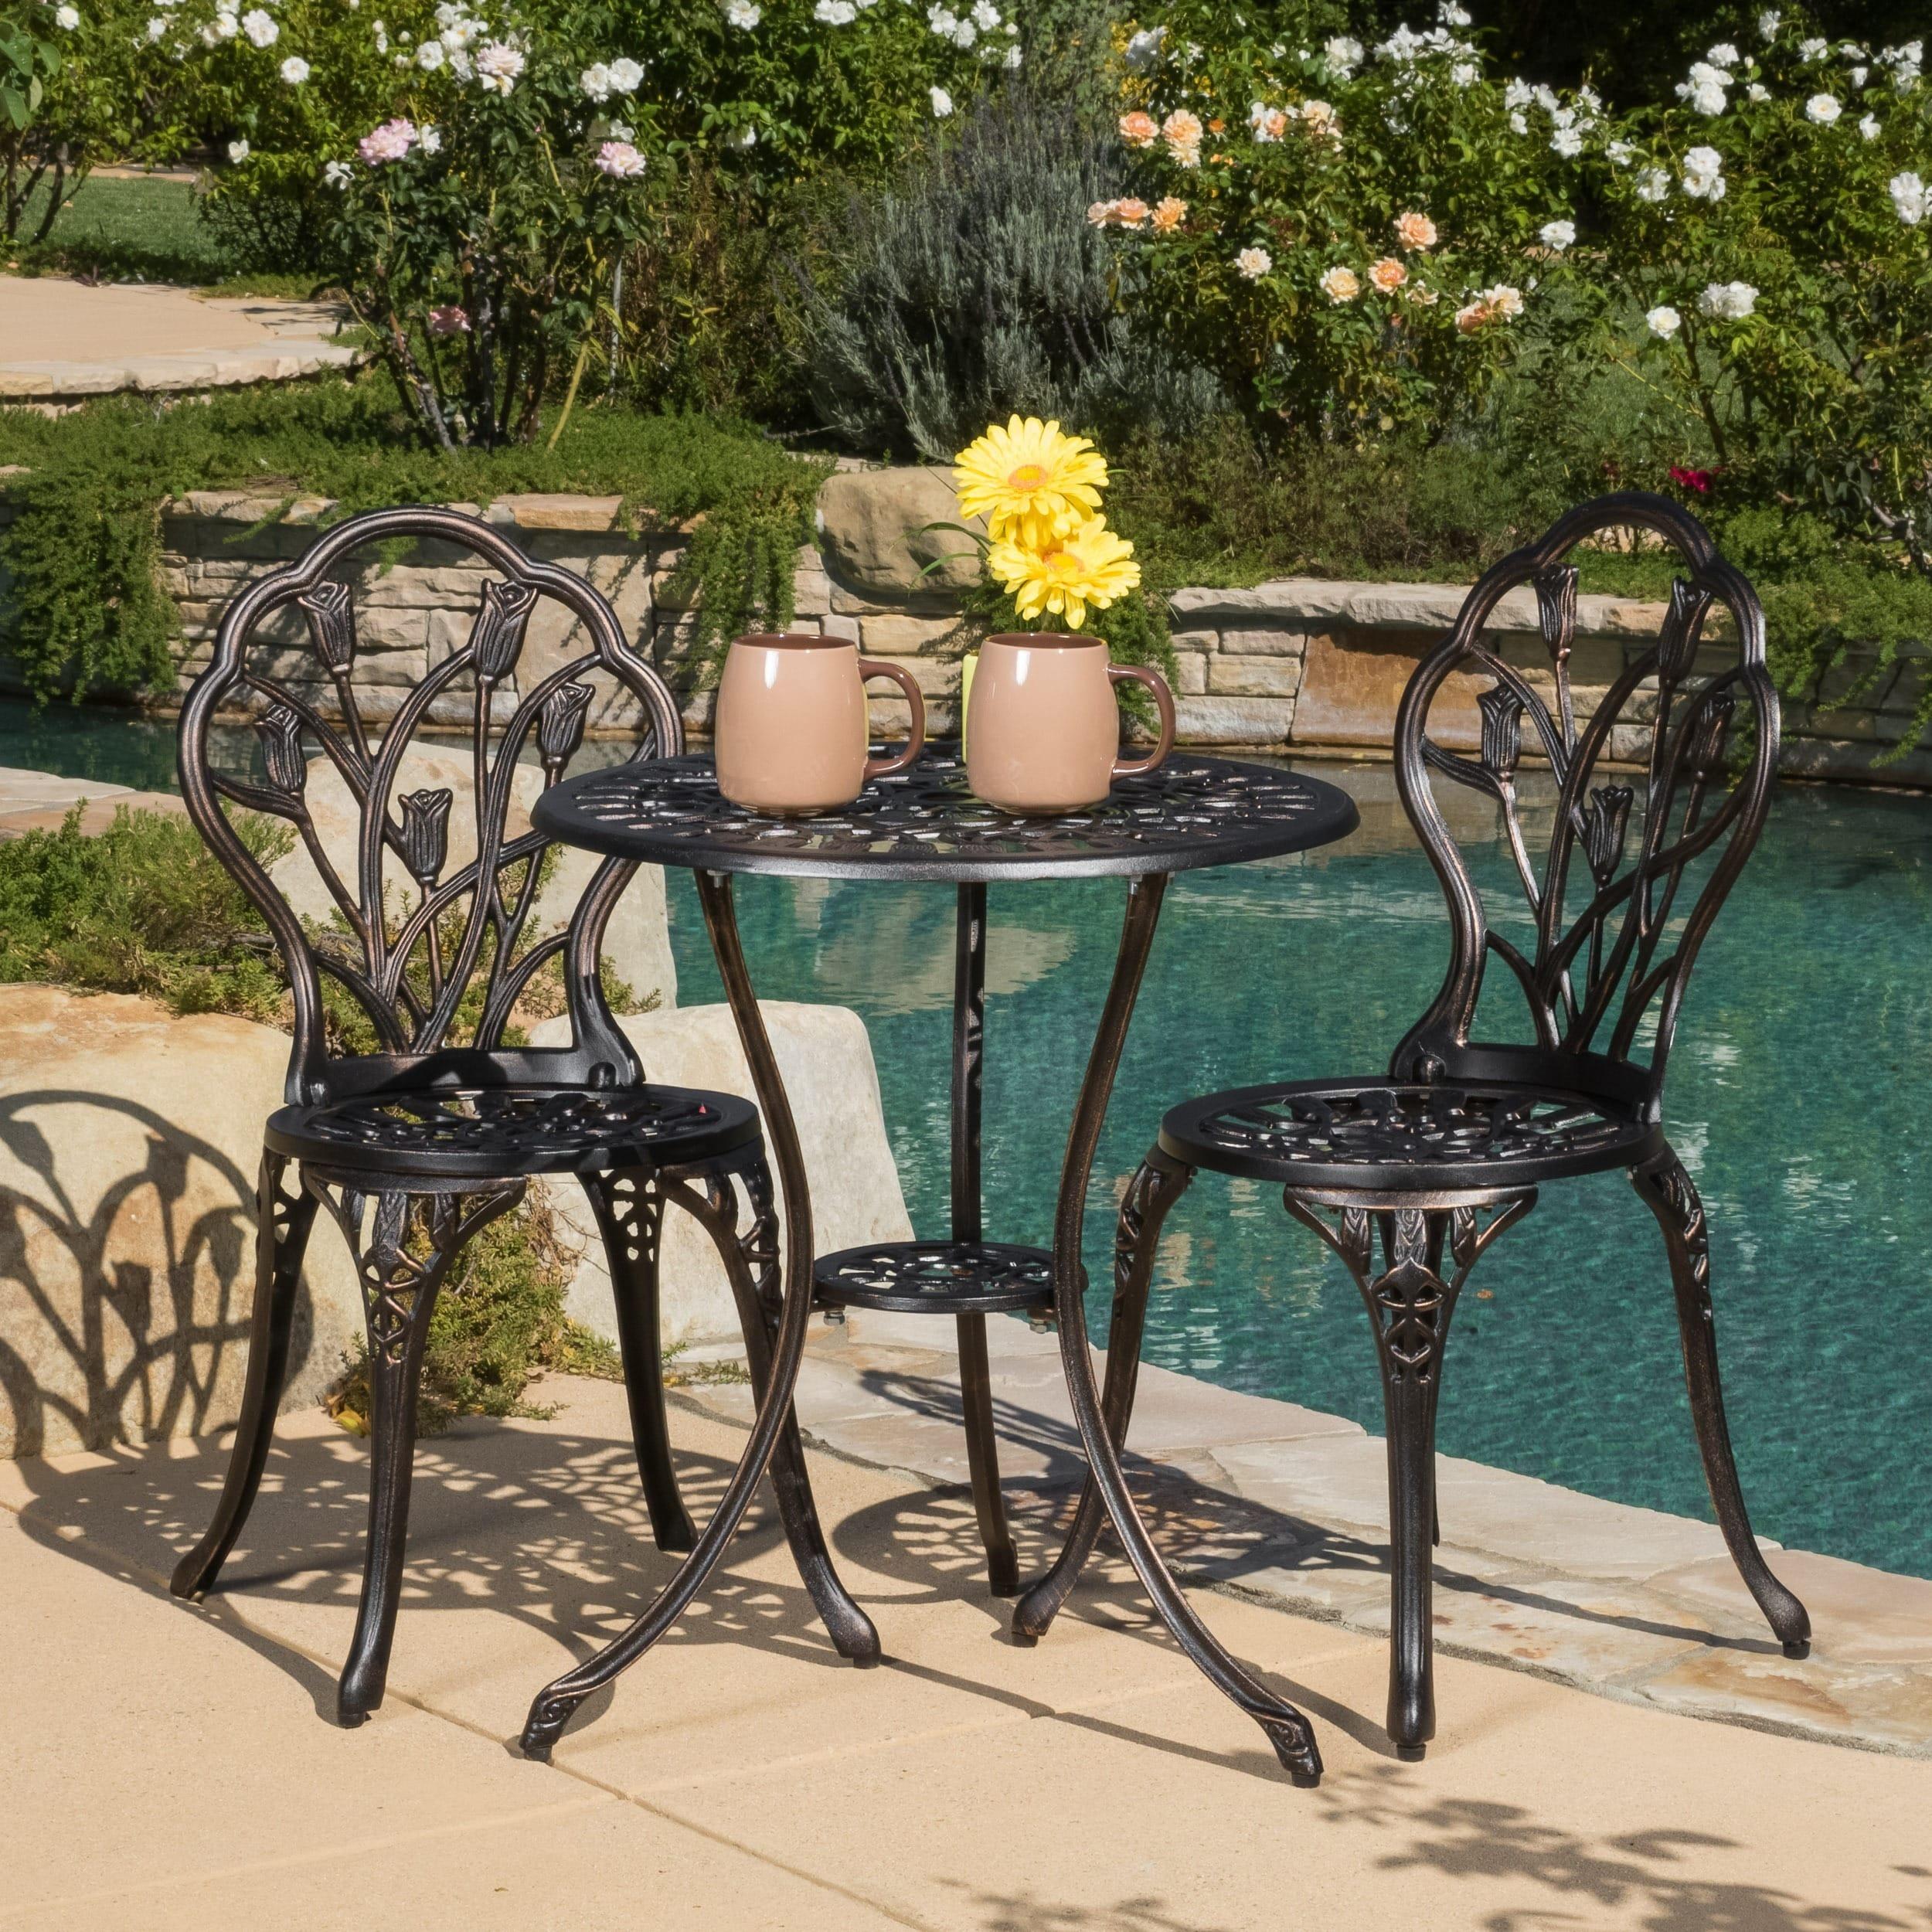 Swell Nassau Cast Aluminum Outdoor Bistro Furniture Set By Christopher Knight Home Uwap Interior Chair Design Uwaporg